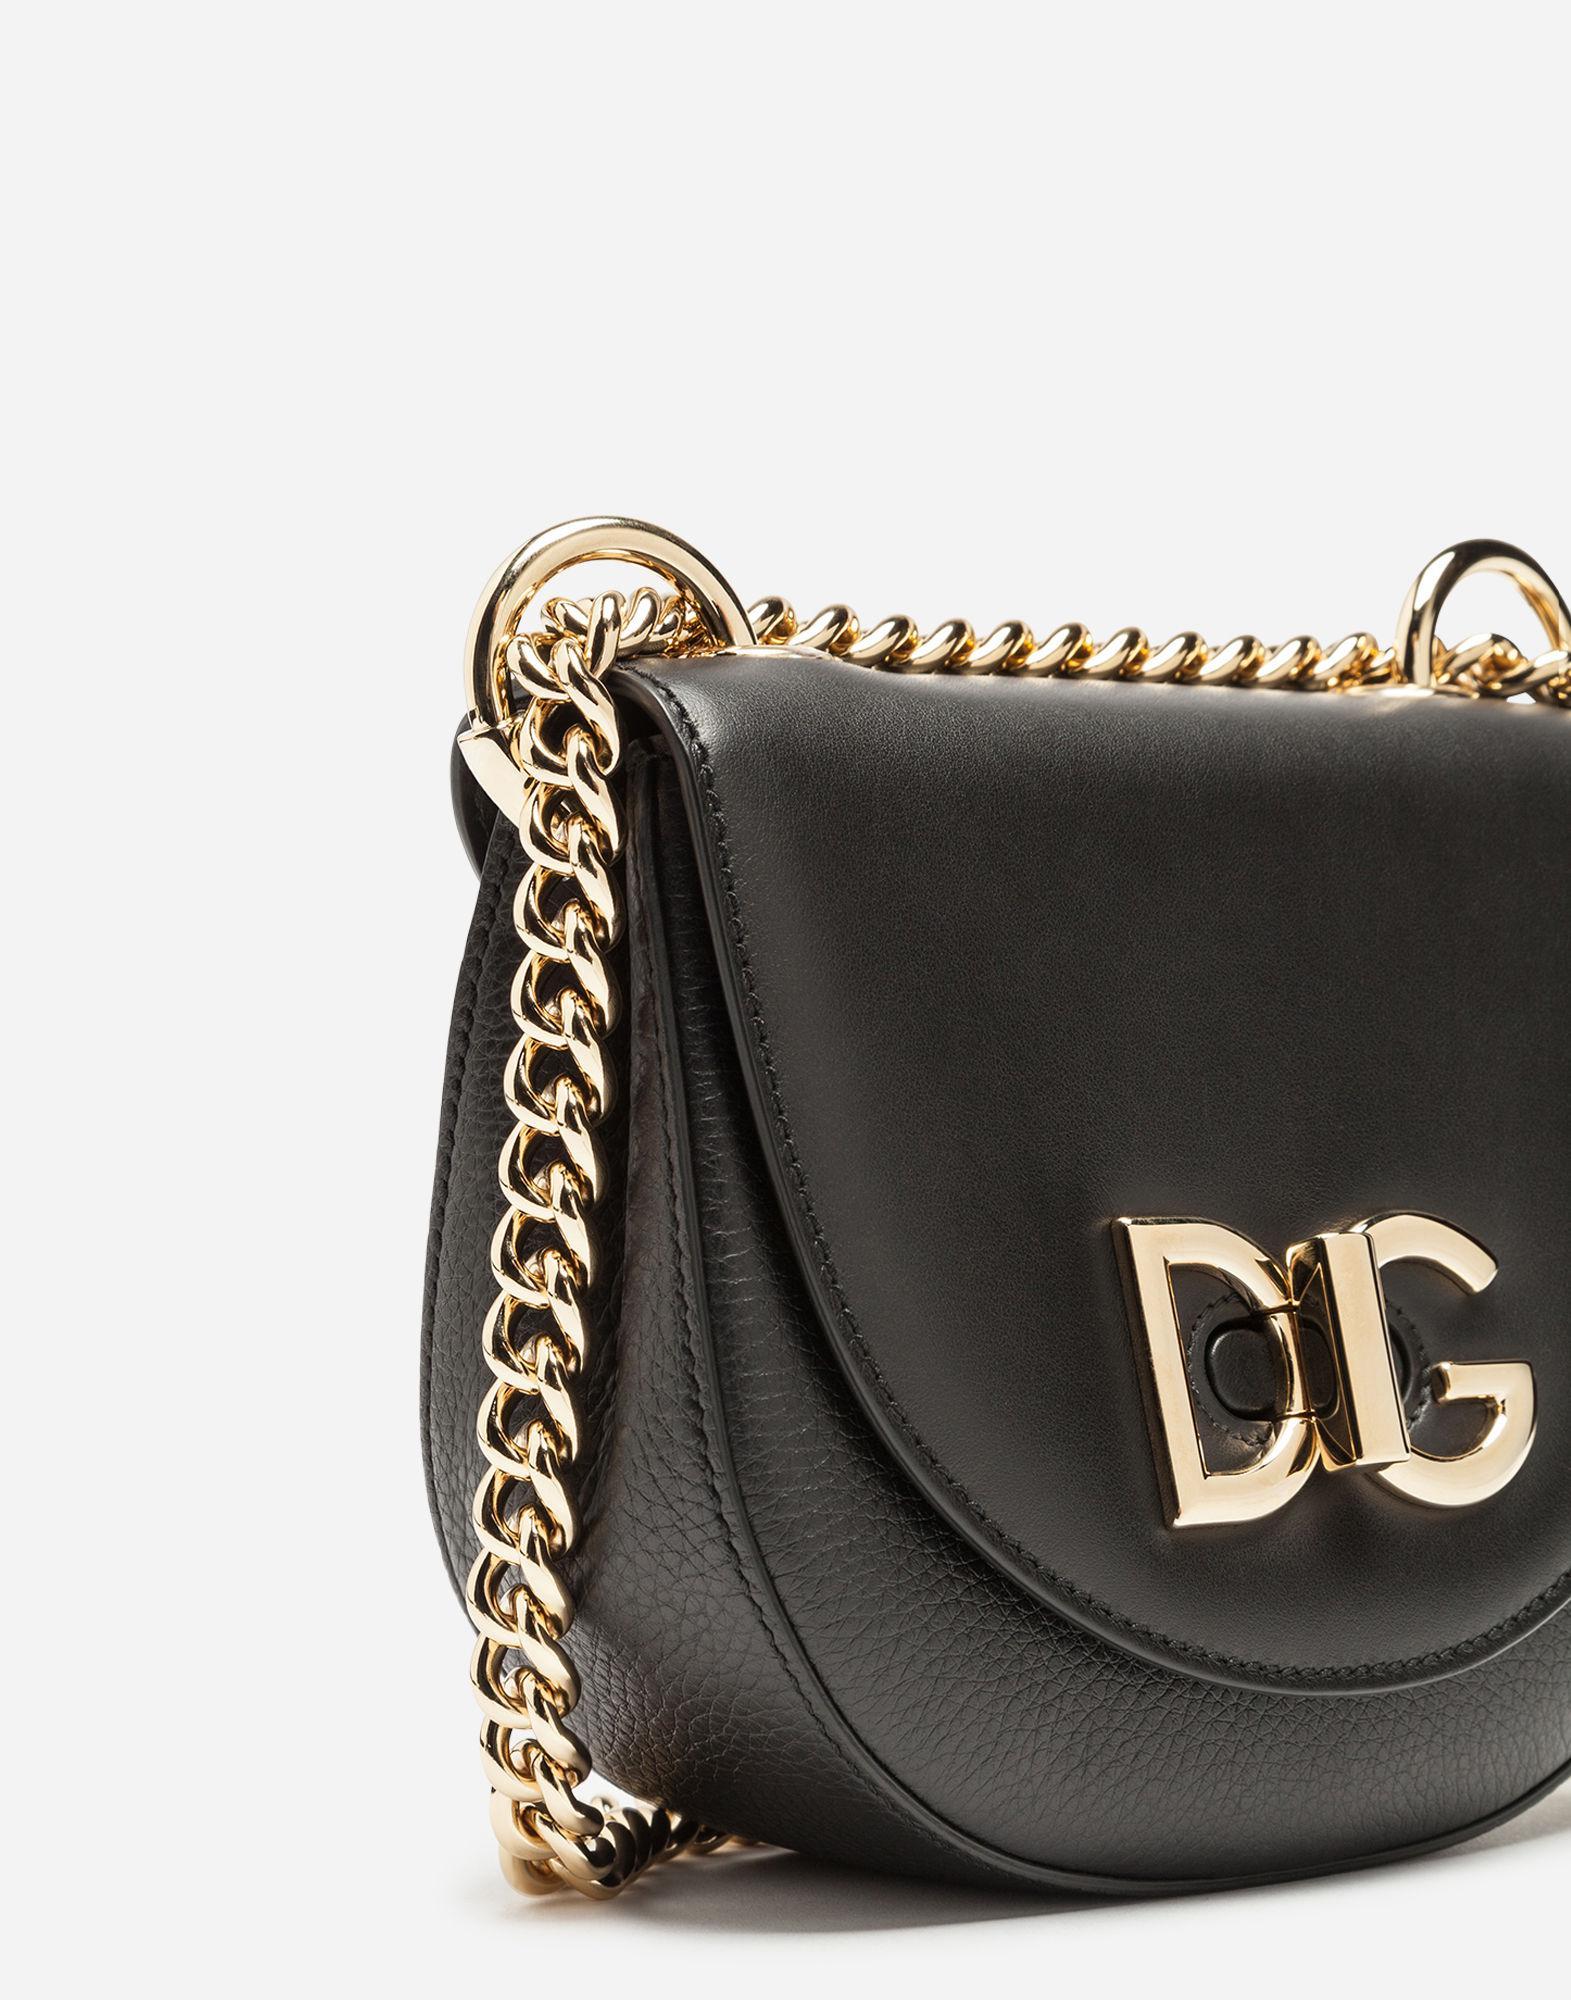 79ab2bc9dcb5 Lyst - Dolce   Gabbana Small Wifi Bag In Calfskin in Black